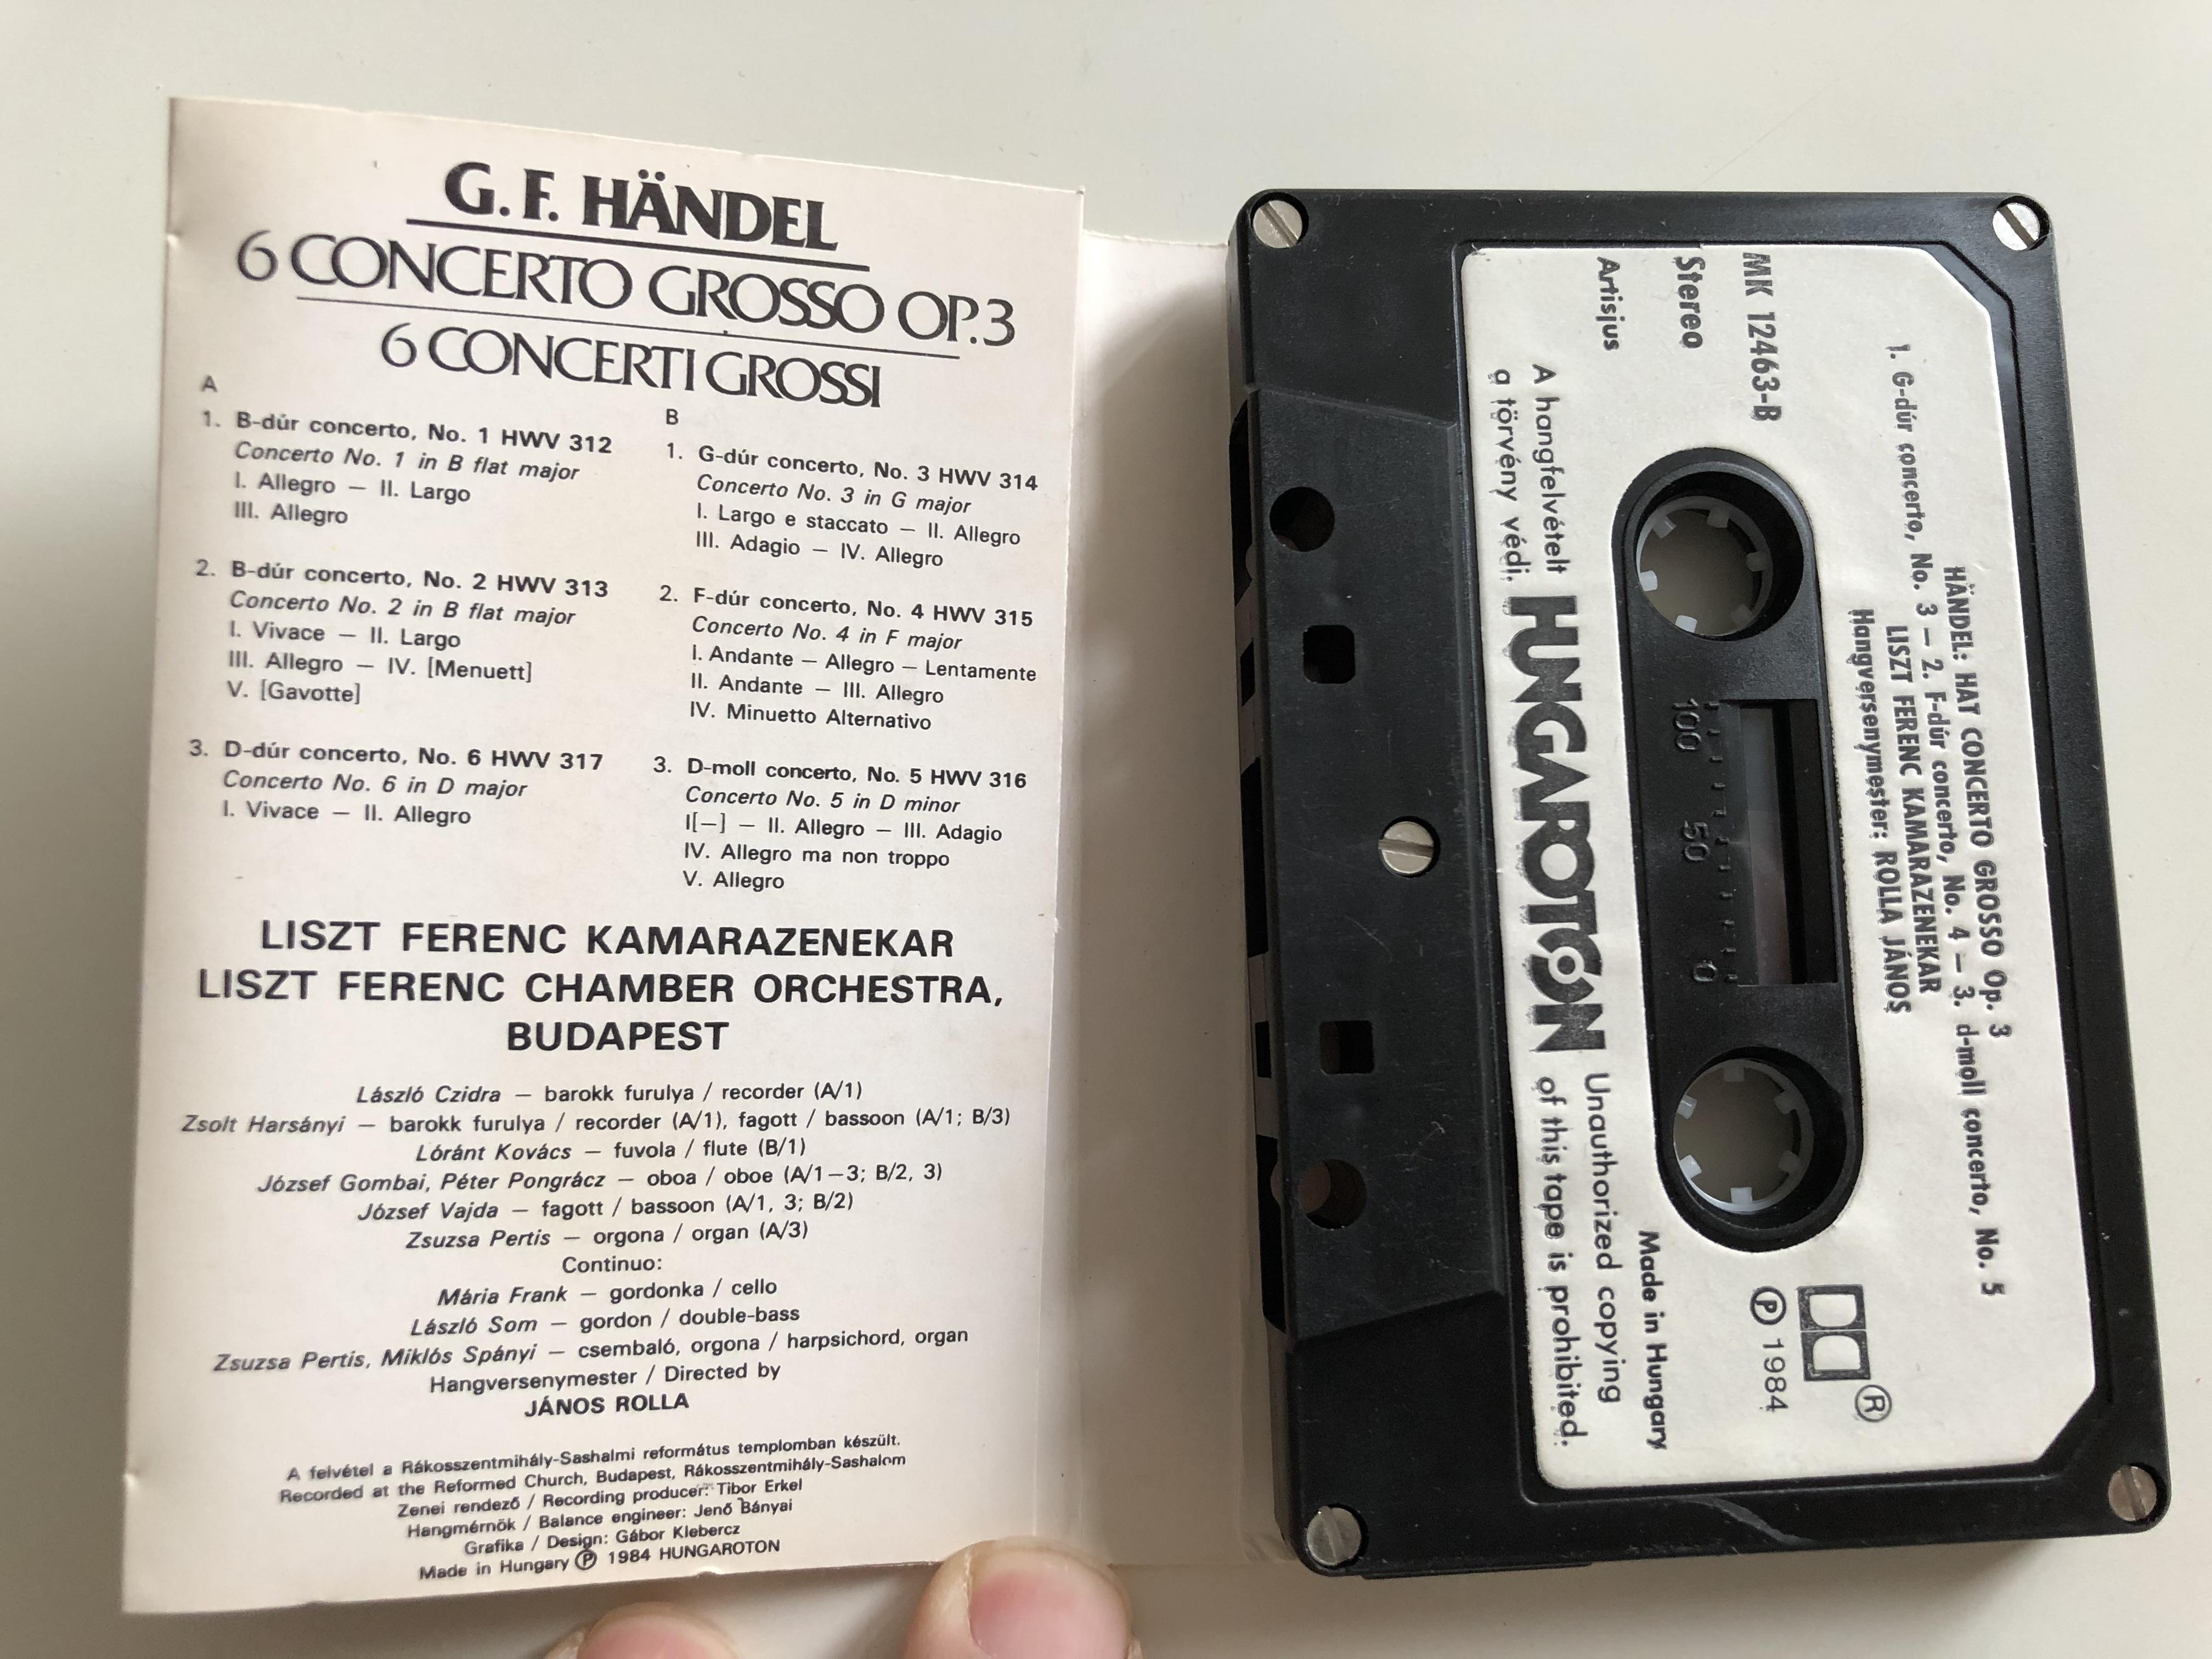 handel-6-concerti-grossi-op.-3-liszt-ferenc-chamber-orchestra-budapest-directed-by-j-nos-rolla-hungaroton-cassette-stereo-mk-12463-2-.jpg